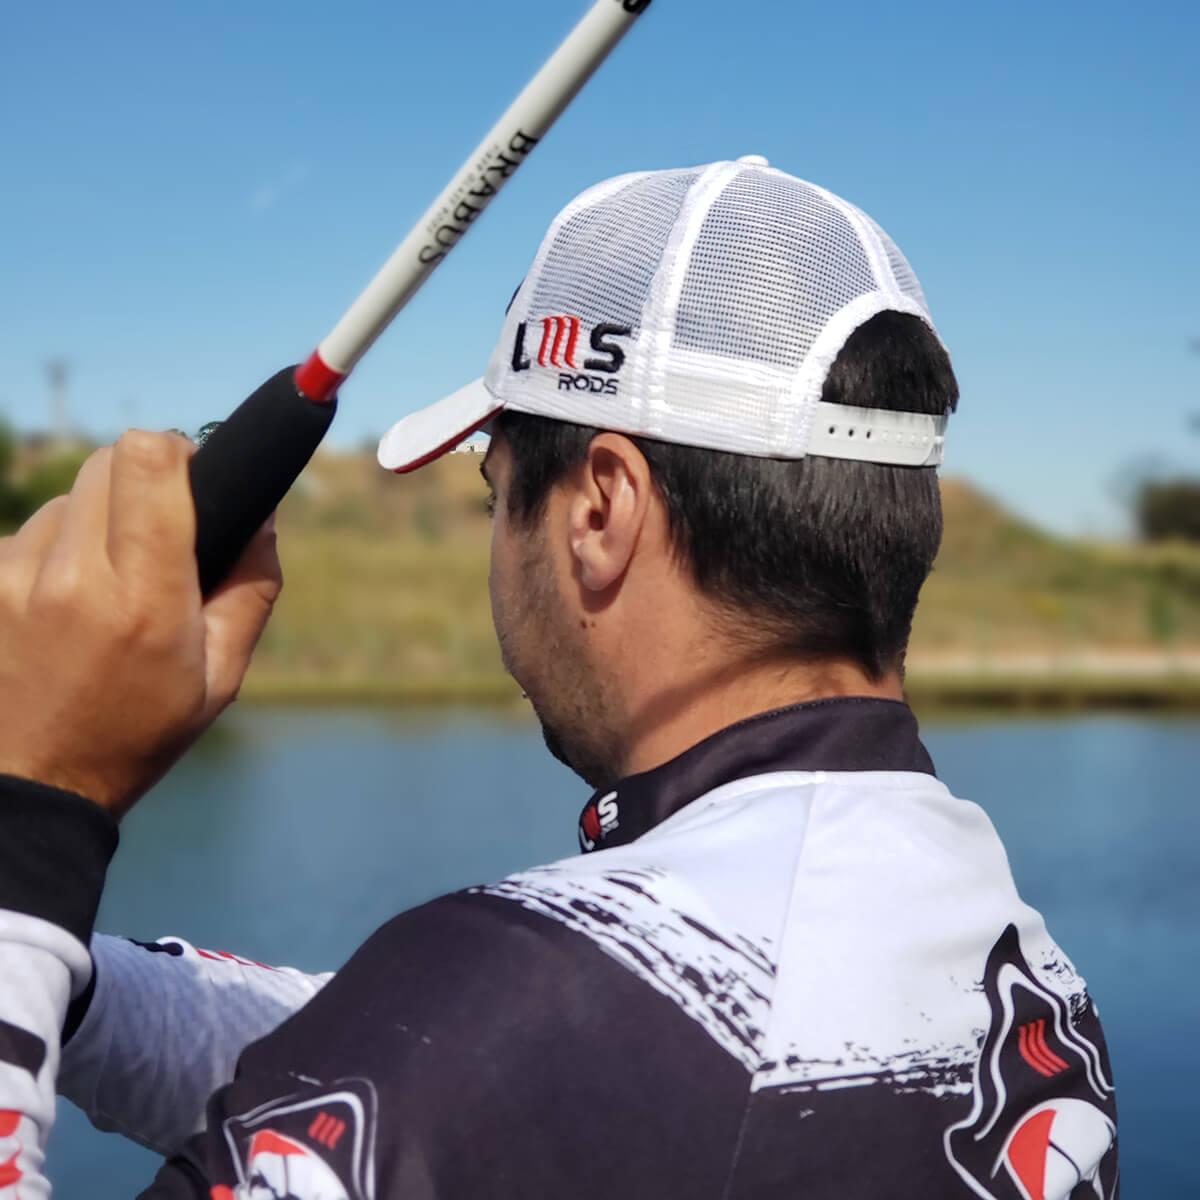 Vara Lumis Brabus p/ Carretilha 1,73 m 60 lbs (2 Partes)  - Pró Pesca Shop